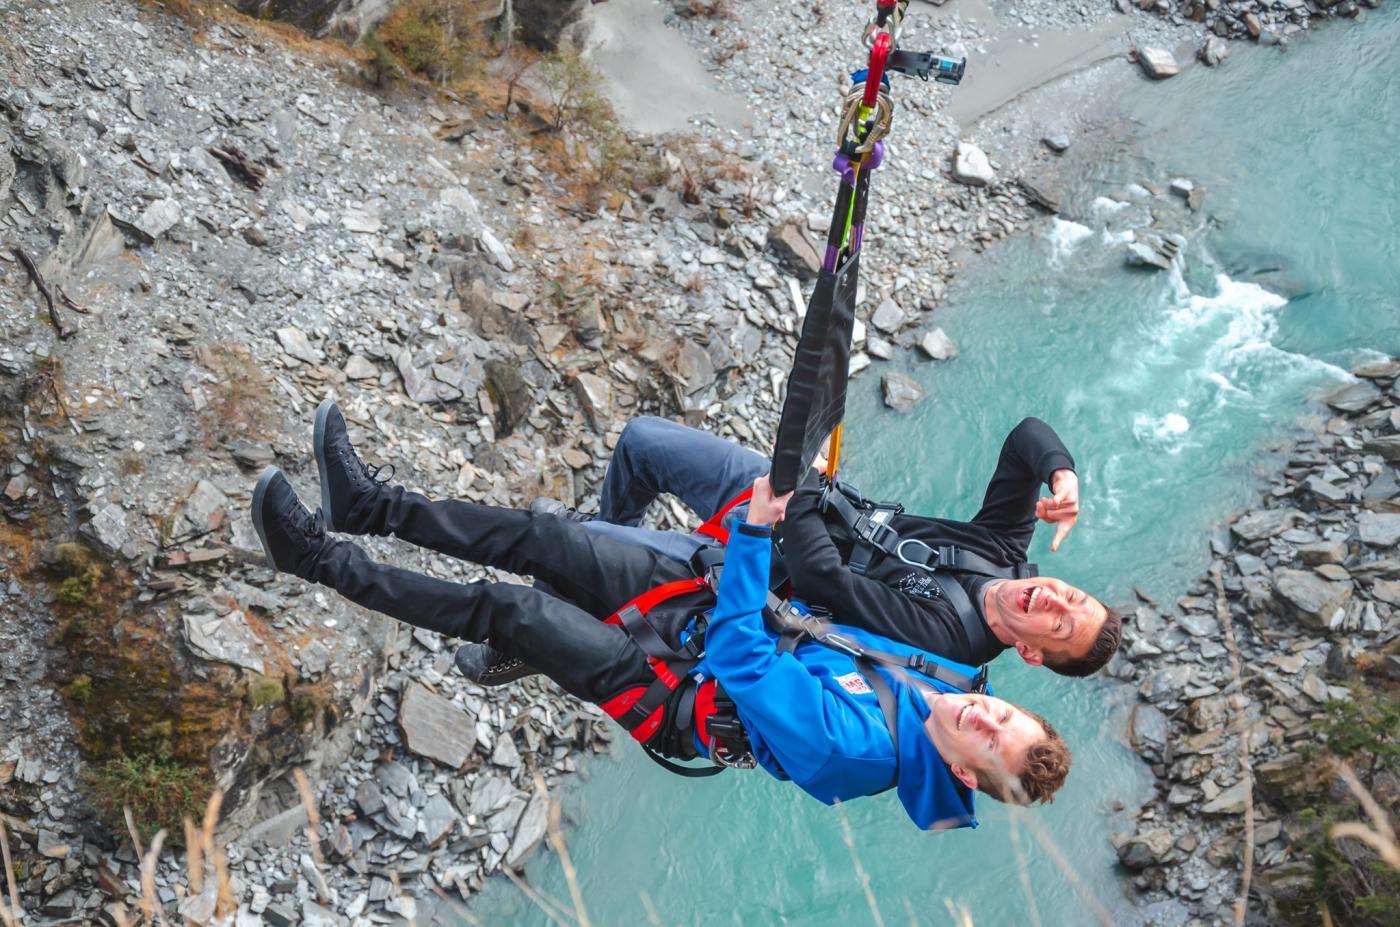 Shotover Canyon Swing - James & Jason